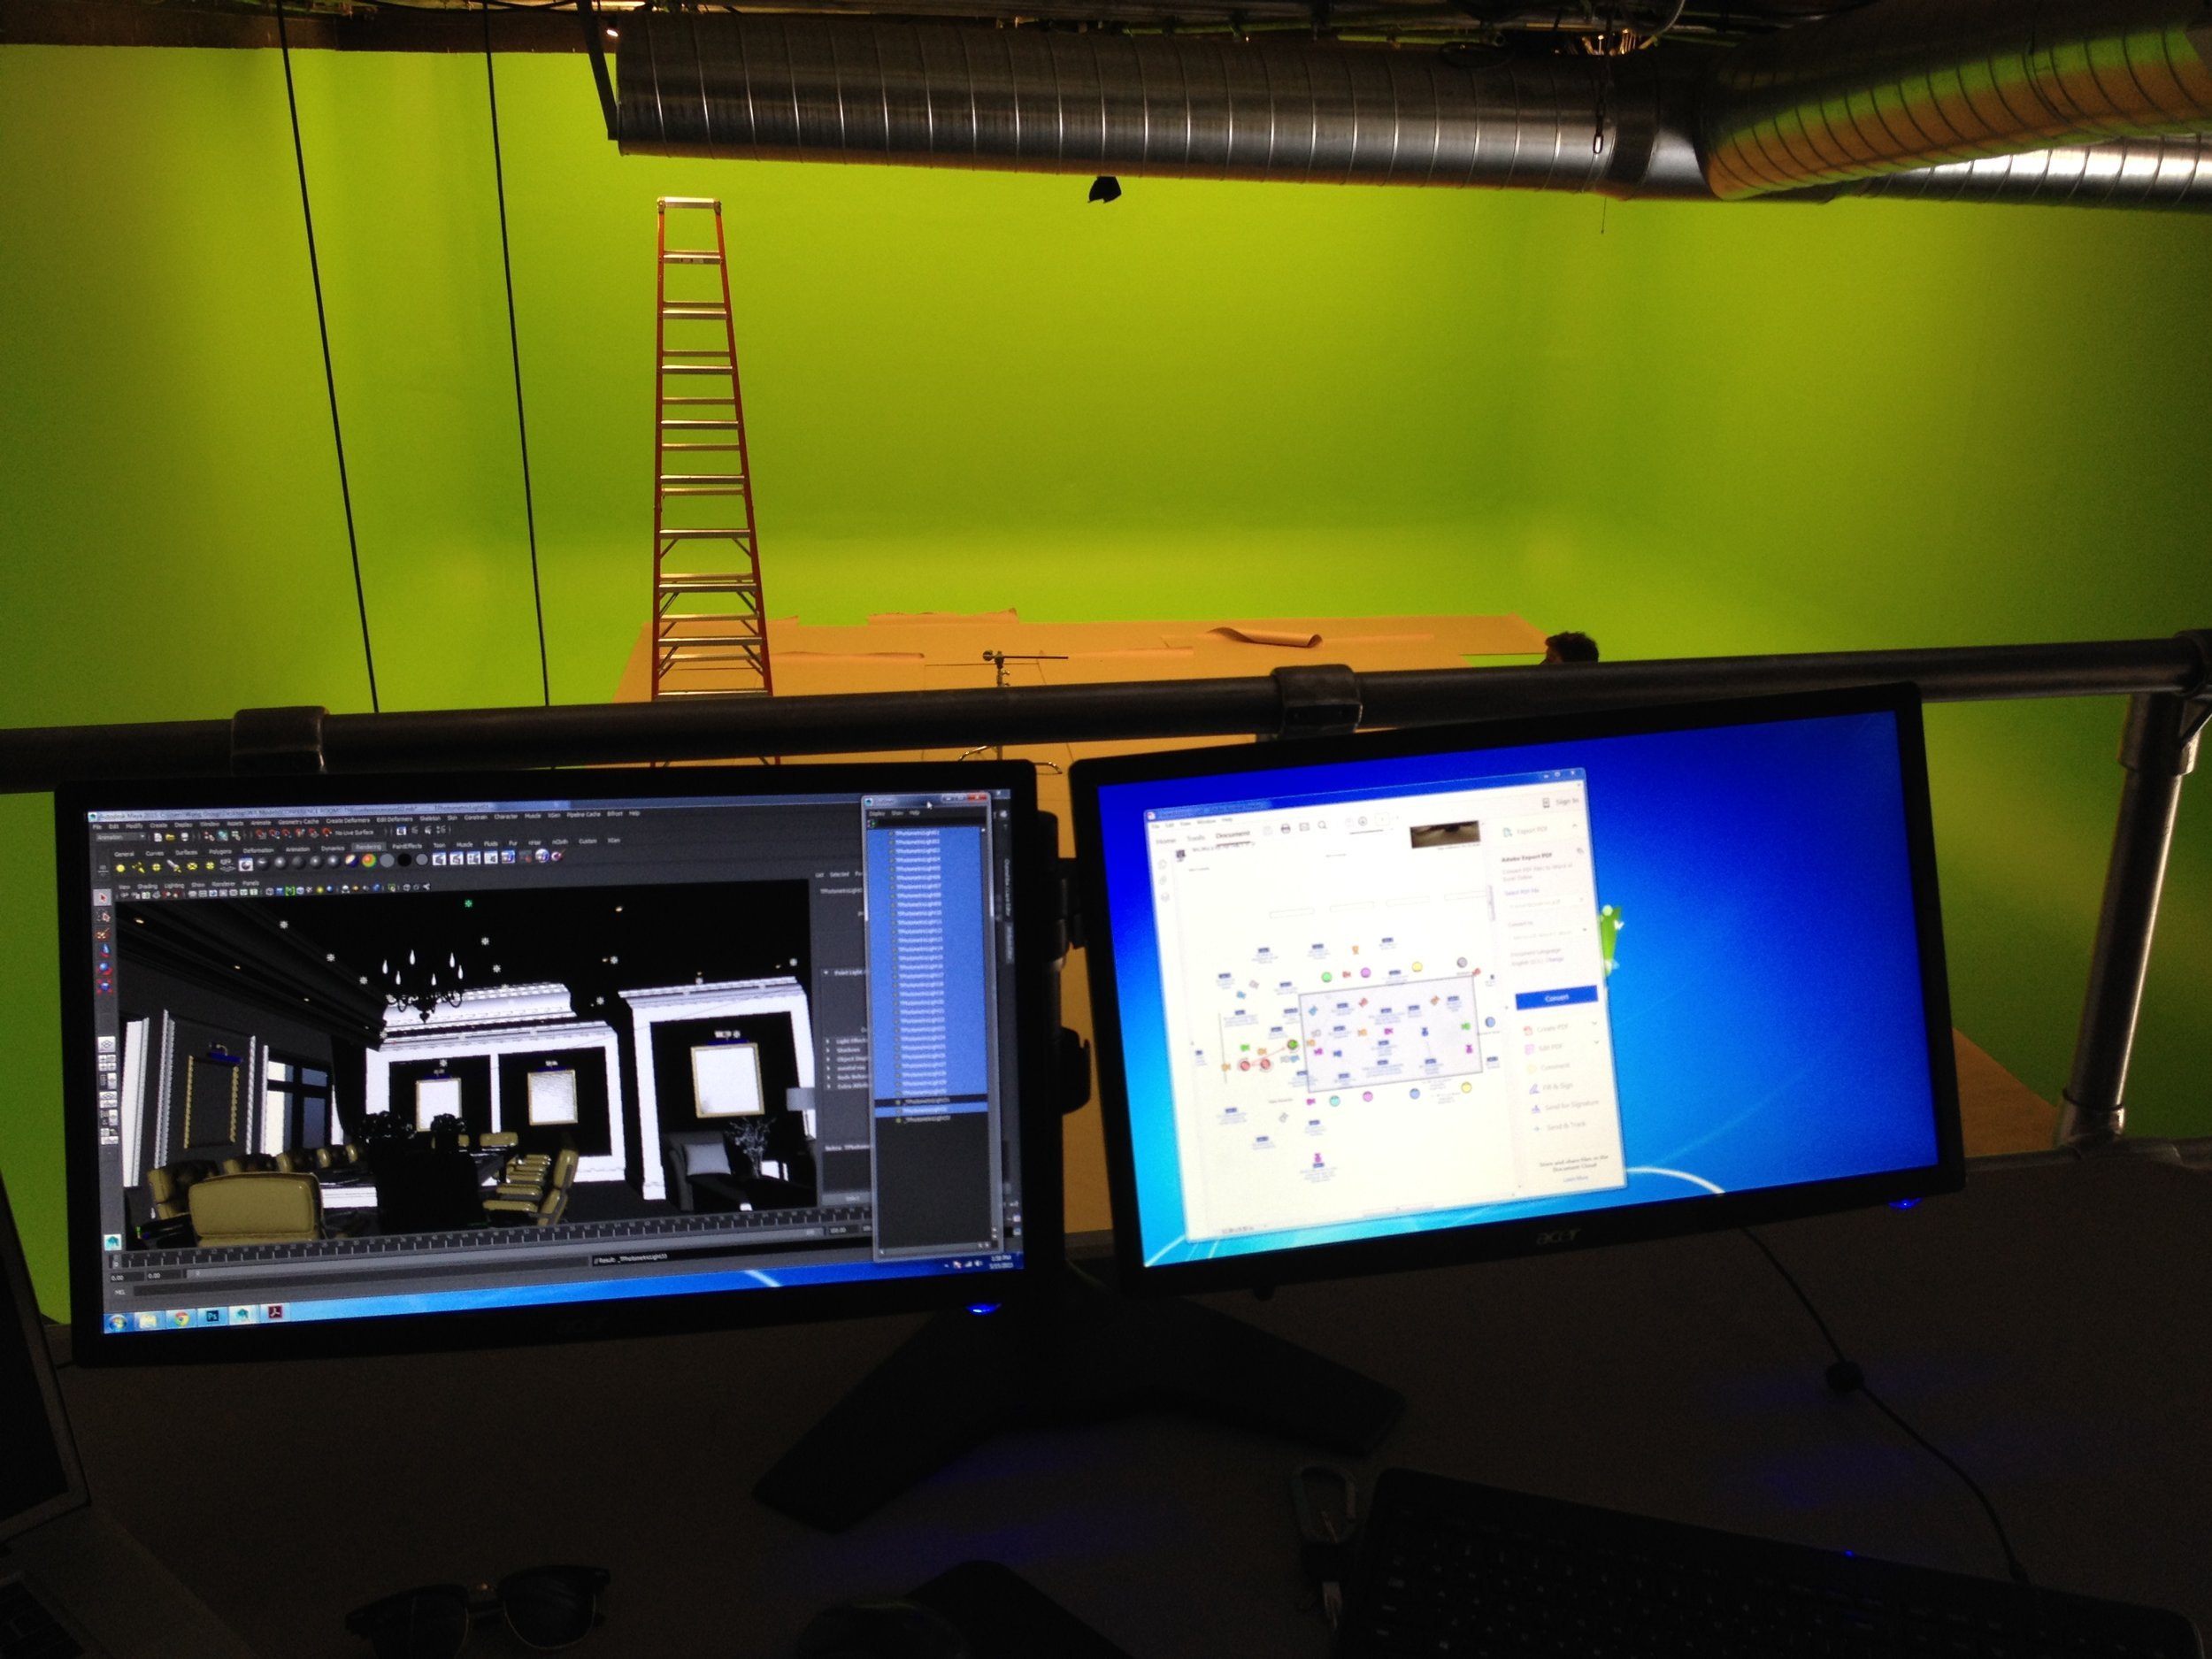 Light Setup and Calibration